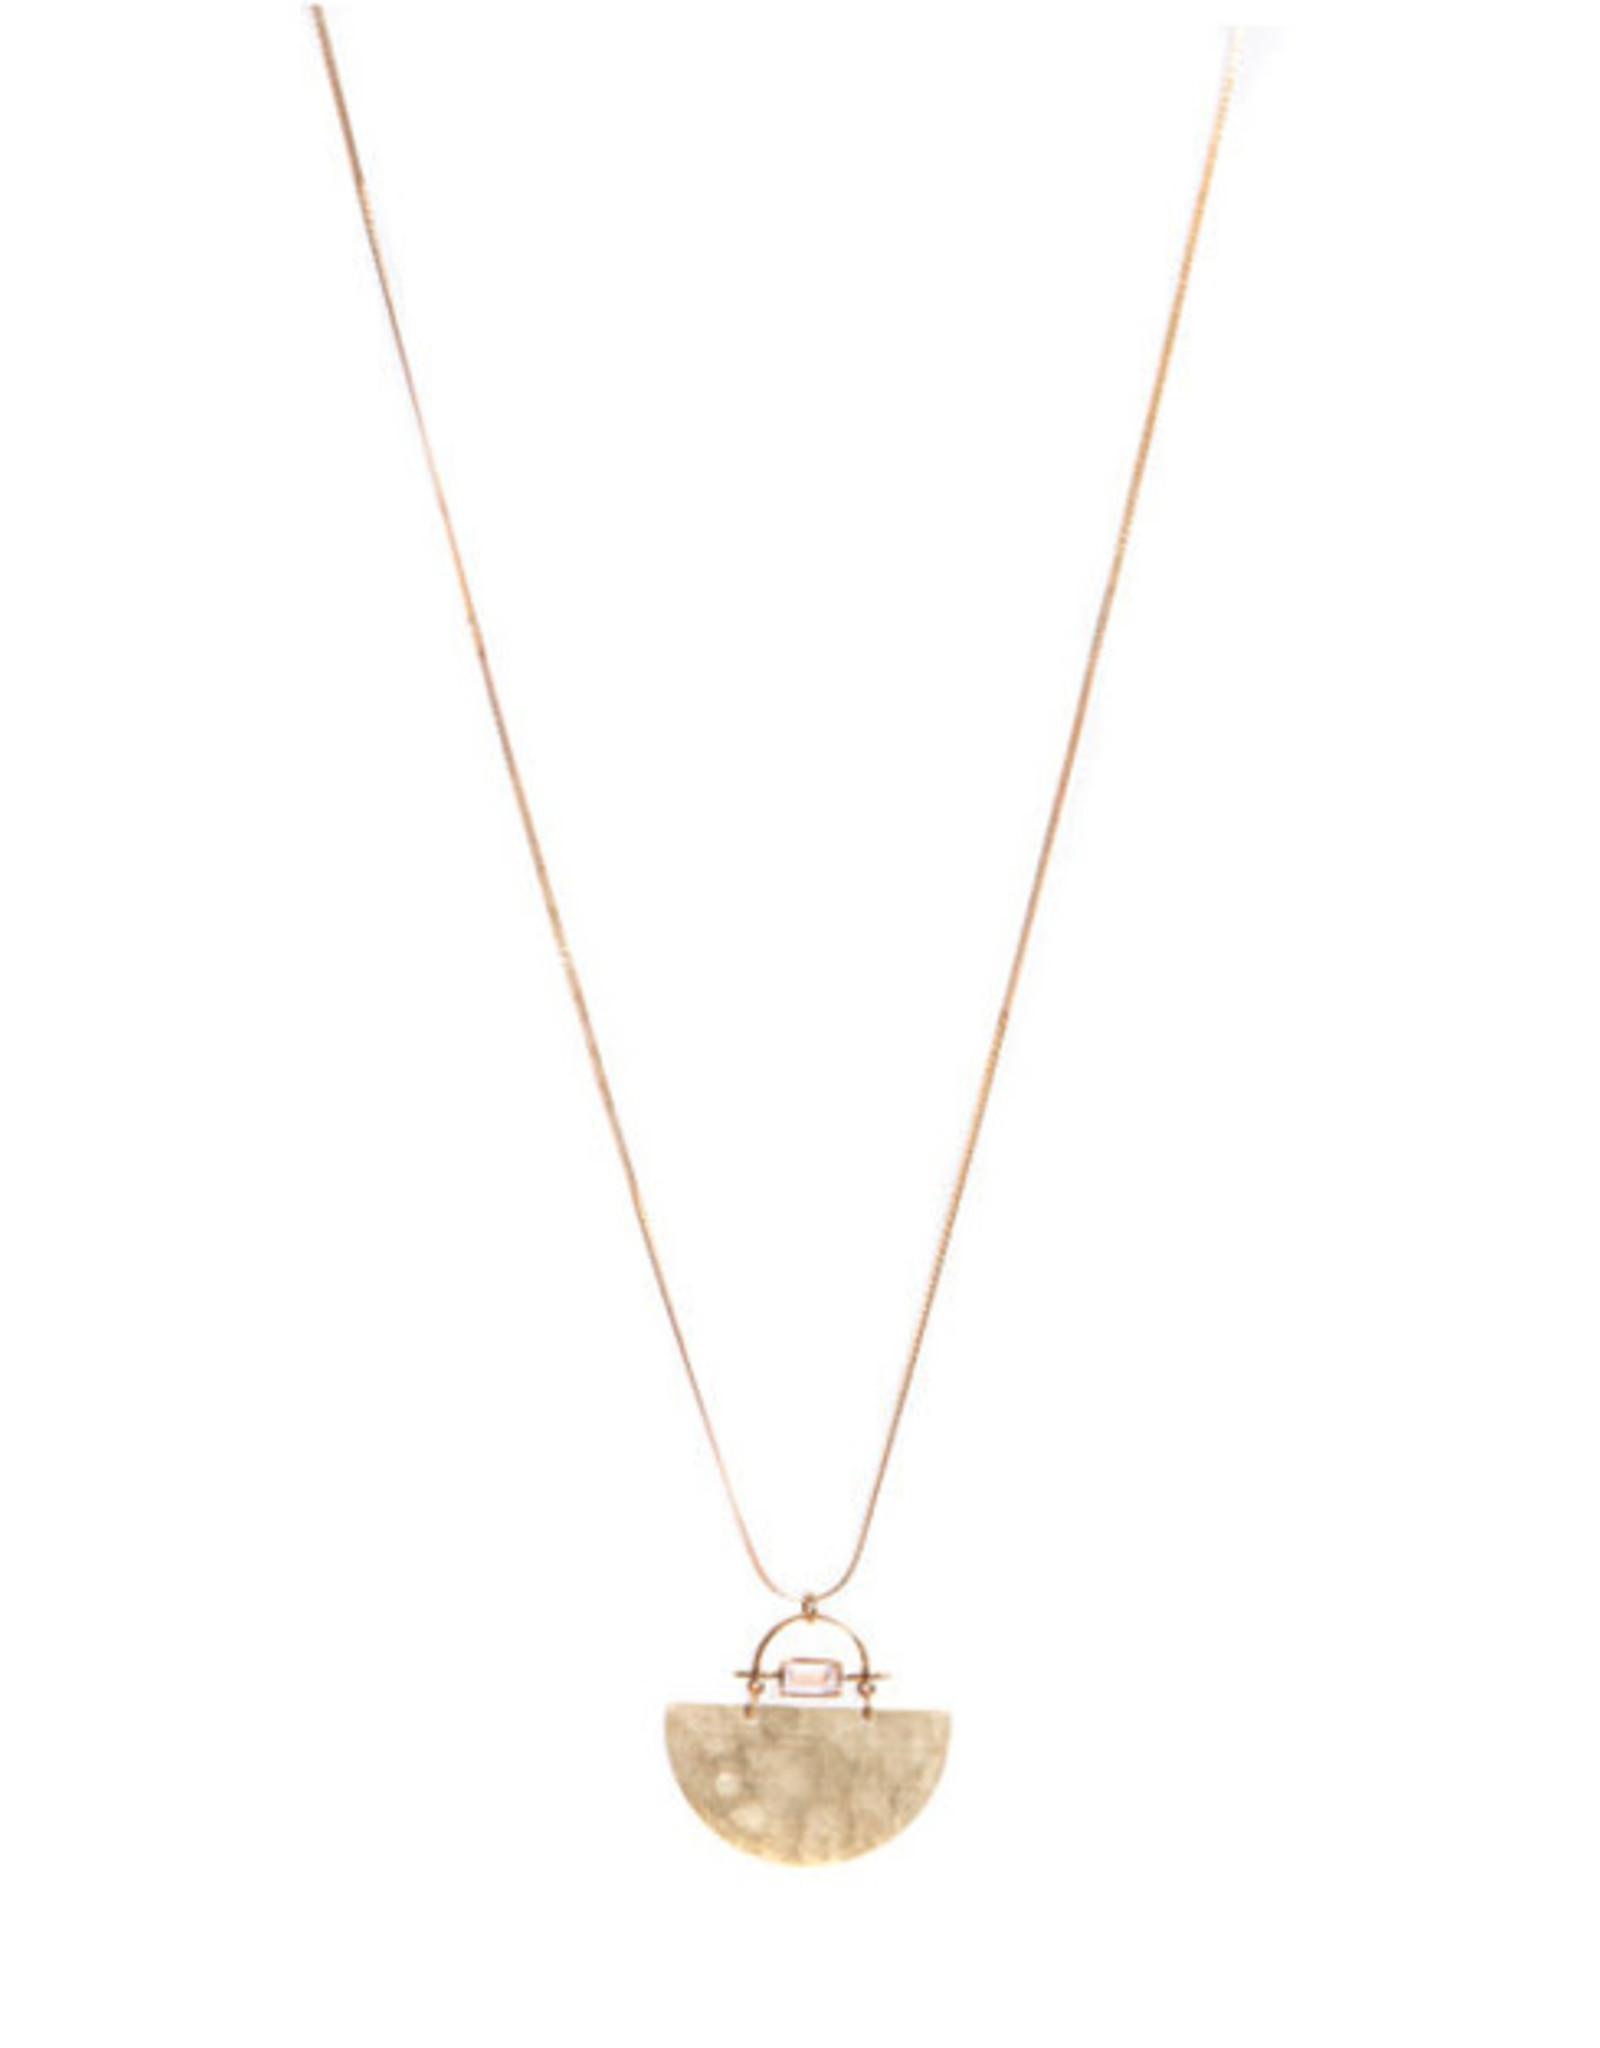 Hailey Gerrits Designs Meridian Necklace - Rose Quartz